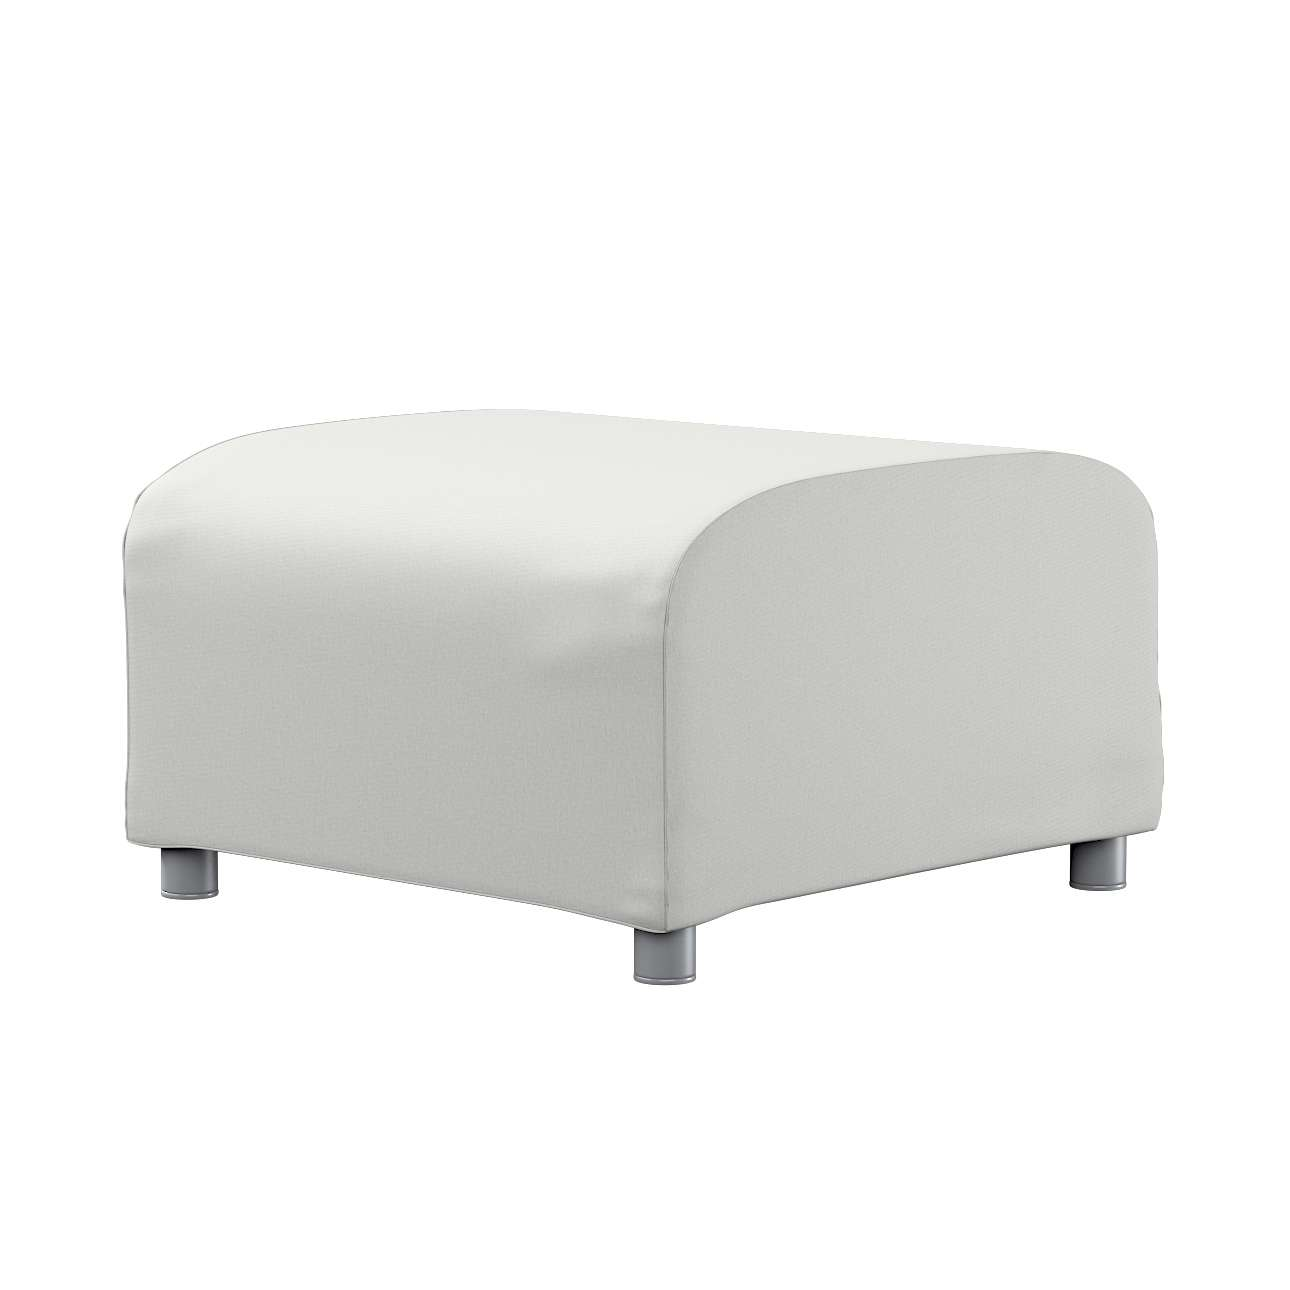 KLIPPAN pufo užvalkalas Klippan footstool cover kolekcijoje Etna , audinys: 705-90